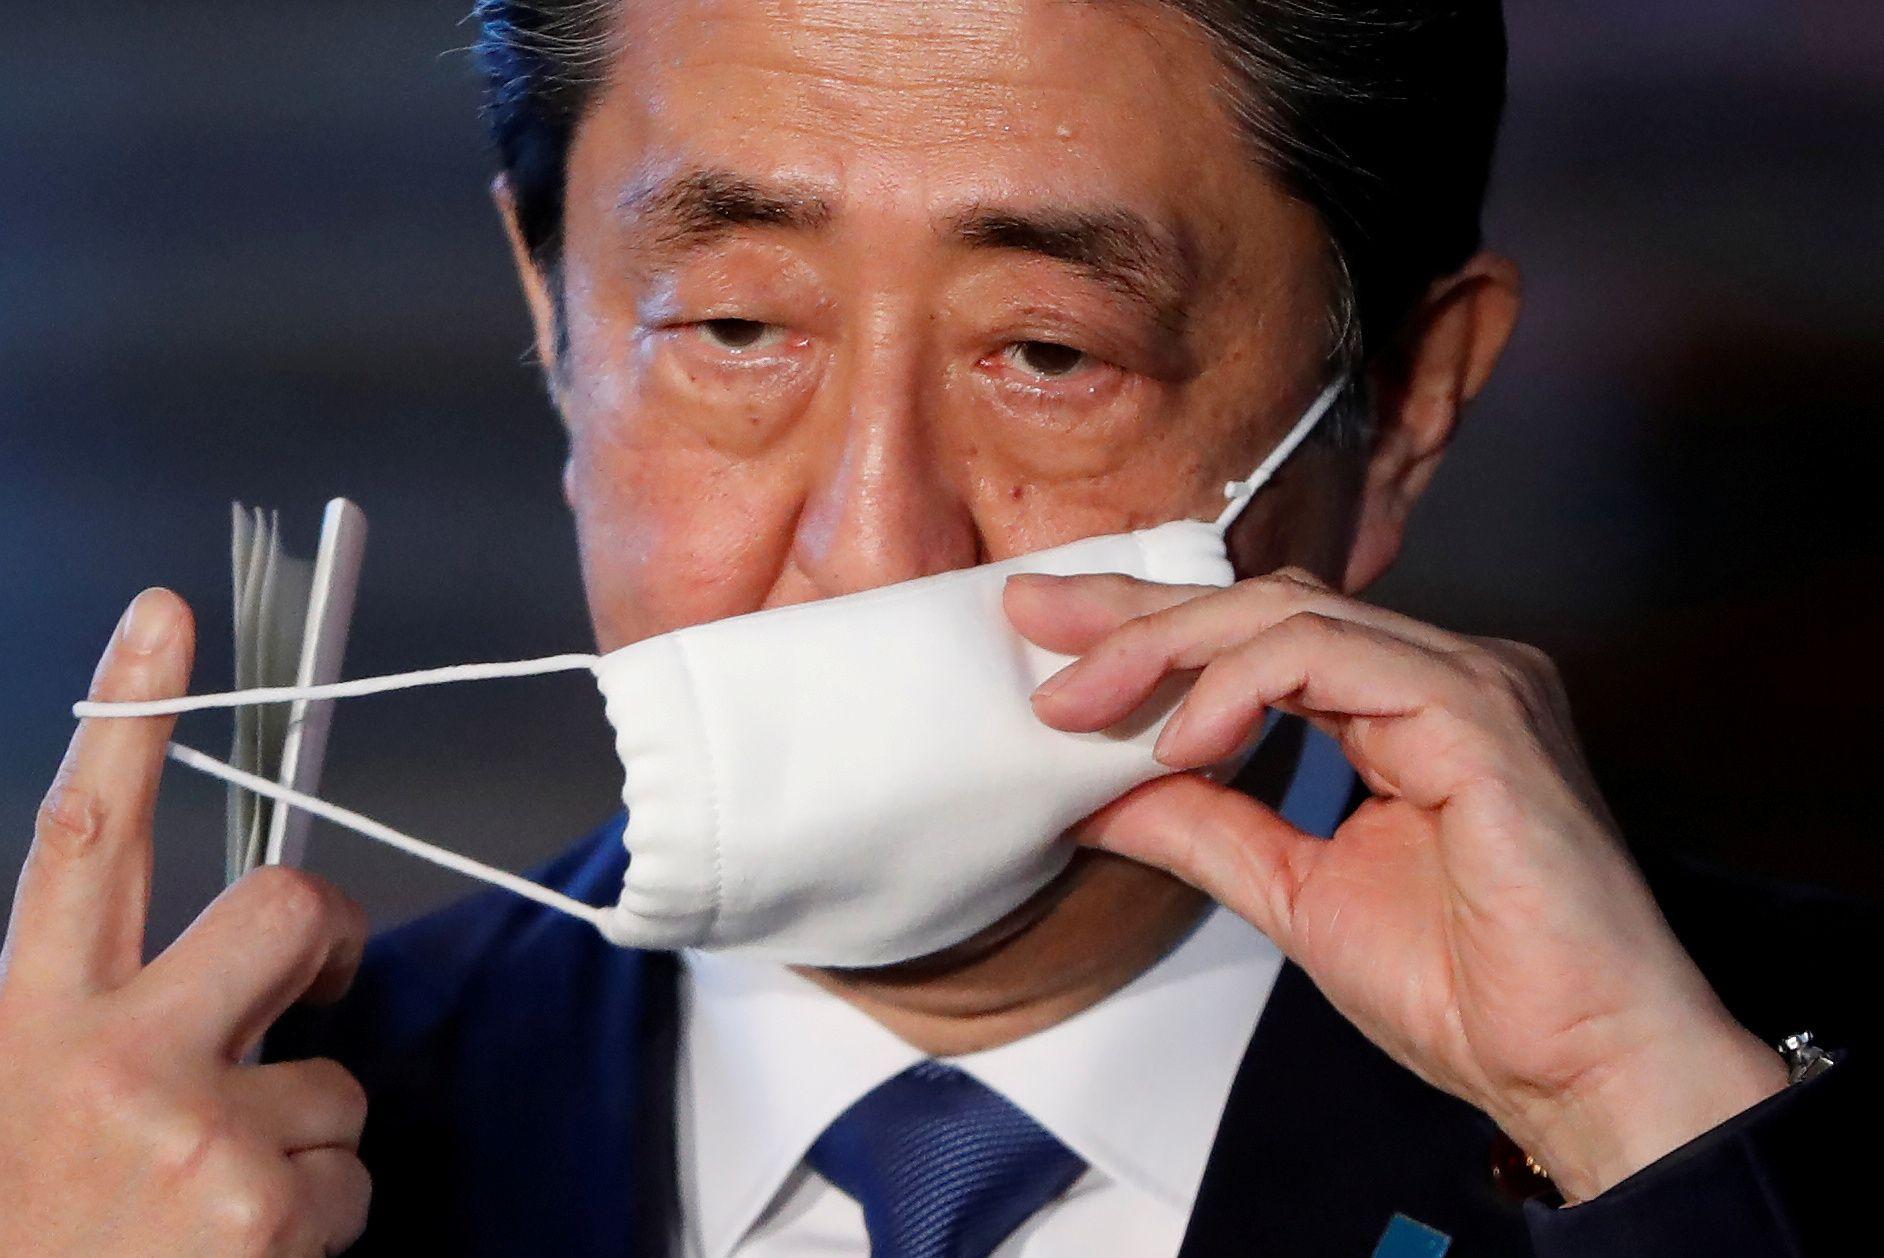 Coronavirus Politics Daily: Japan's emergency, domestic violence, LatAm seeks IMF help